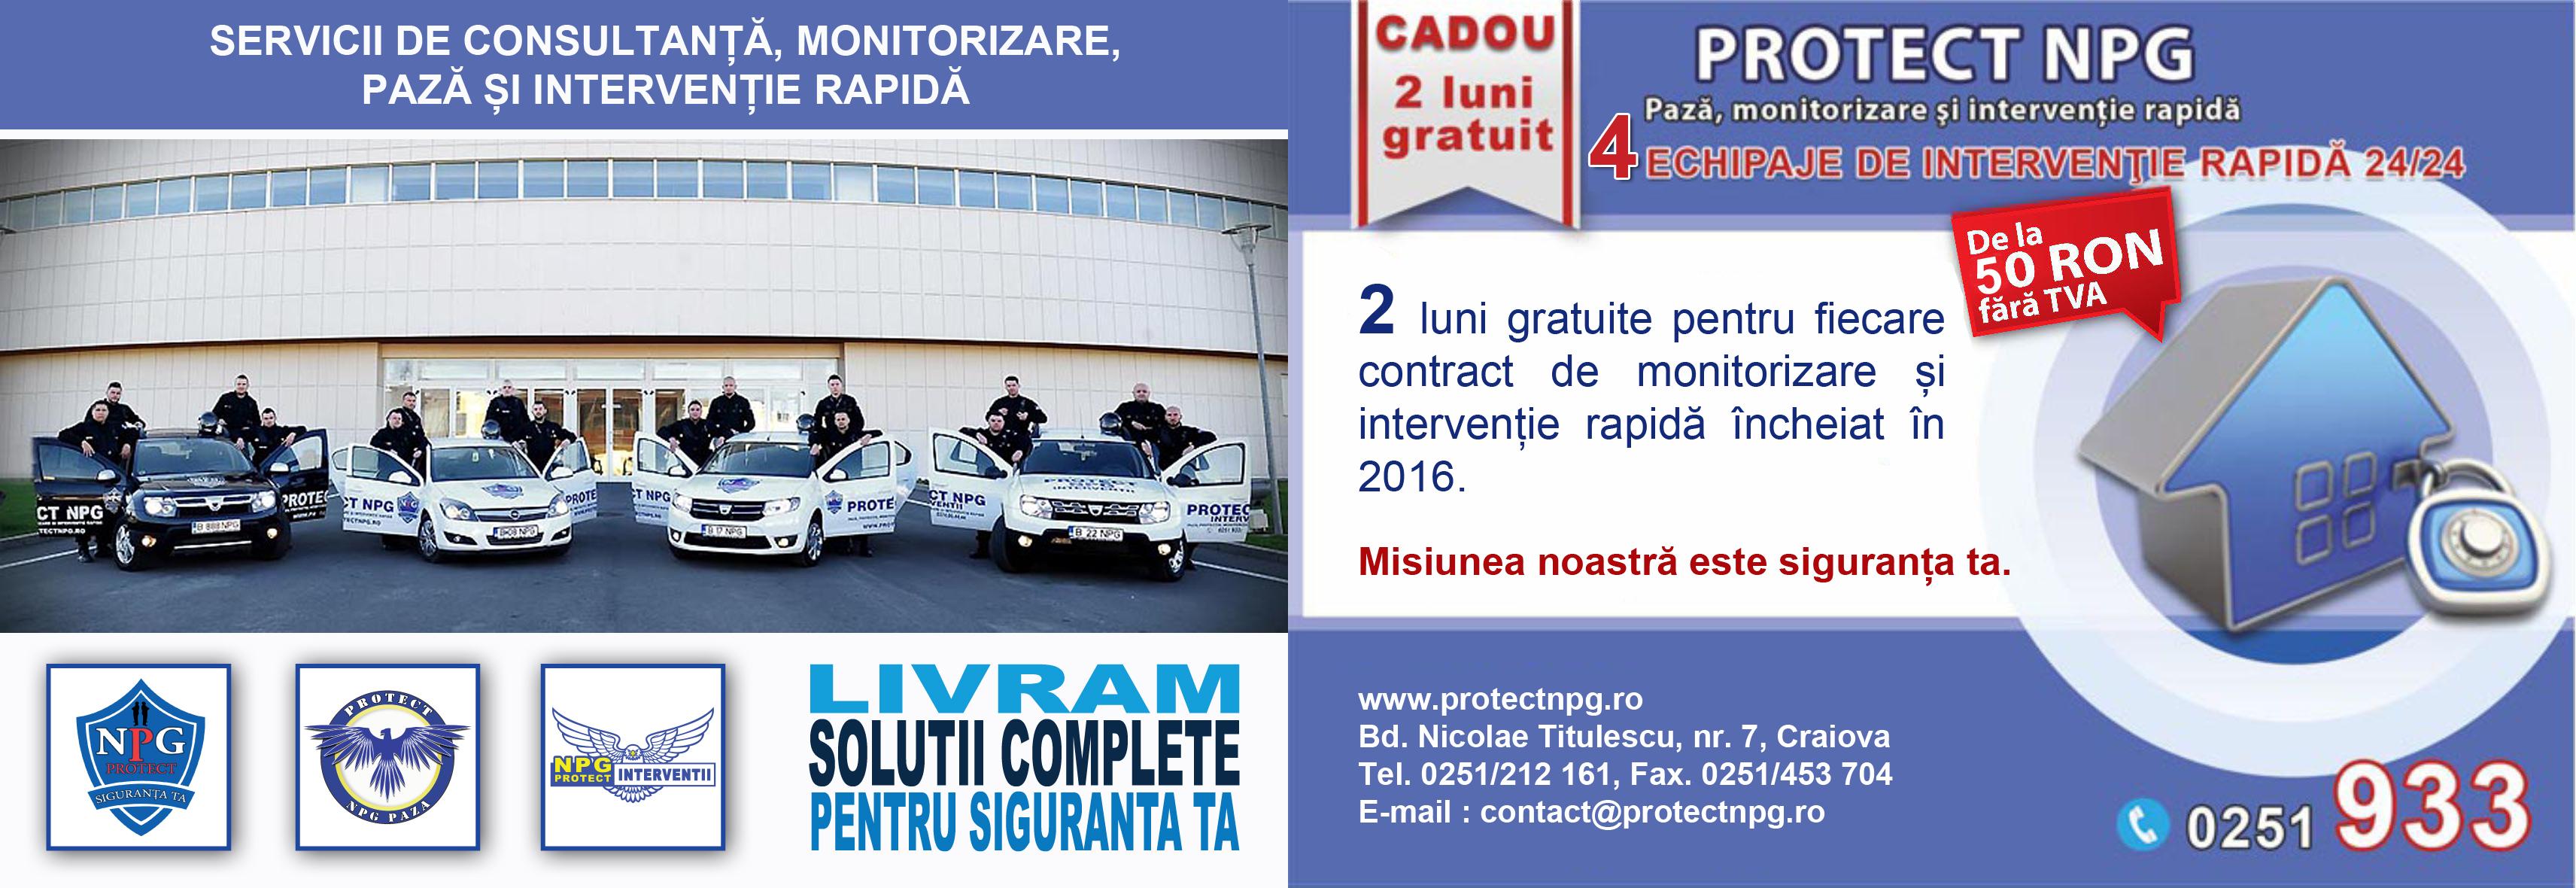 servicii-protect-npg-50-lei